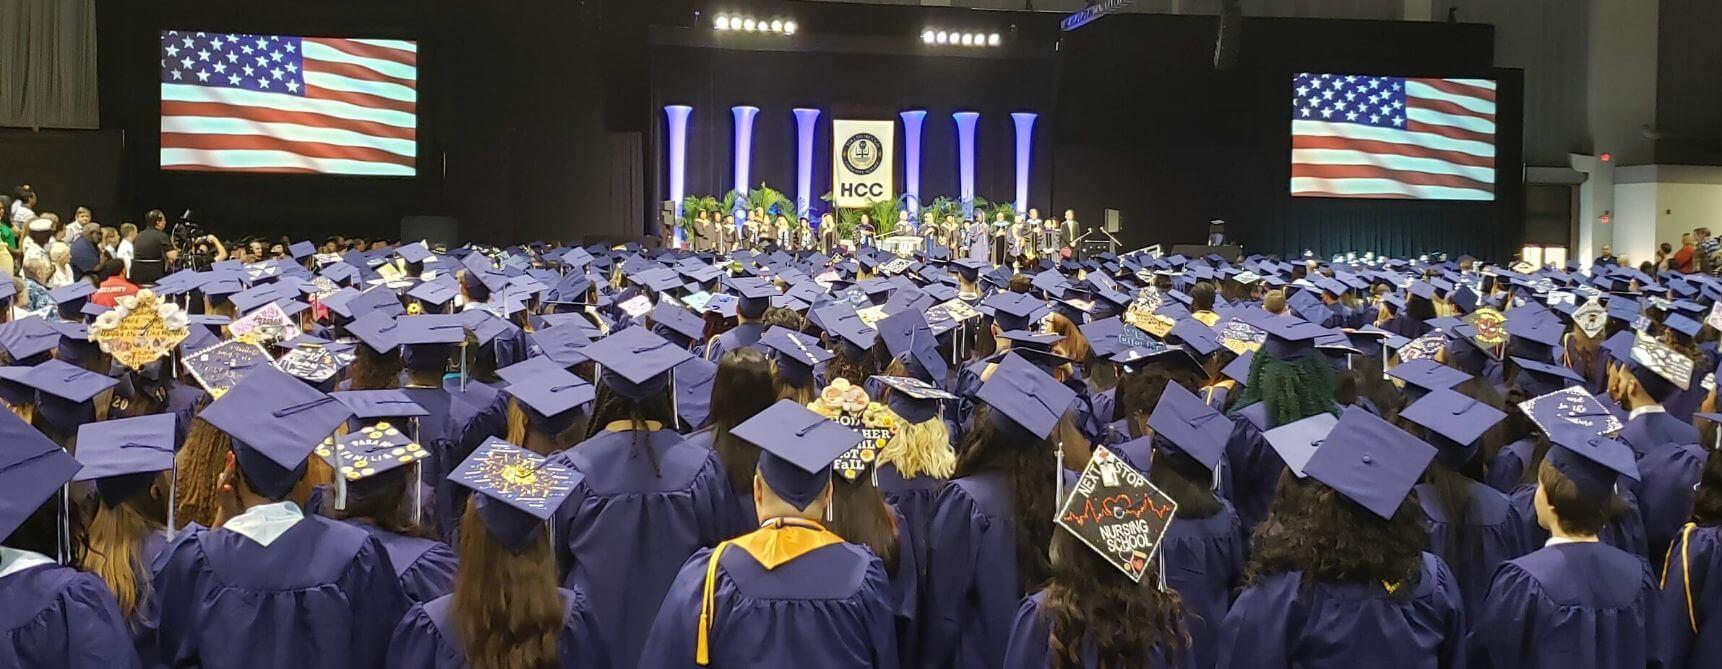 4 HCC Graduation Ceremony Design